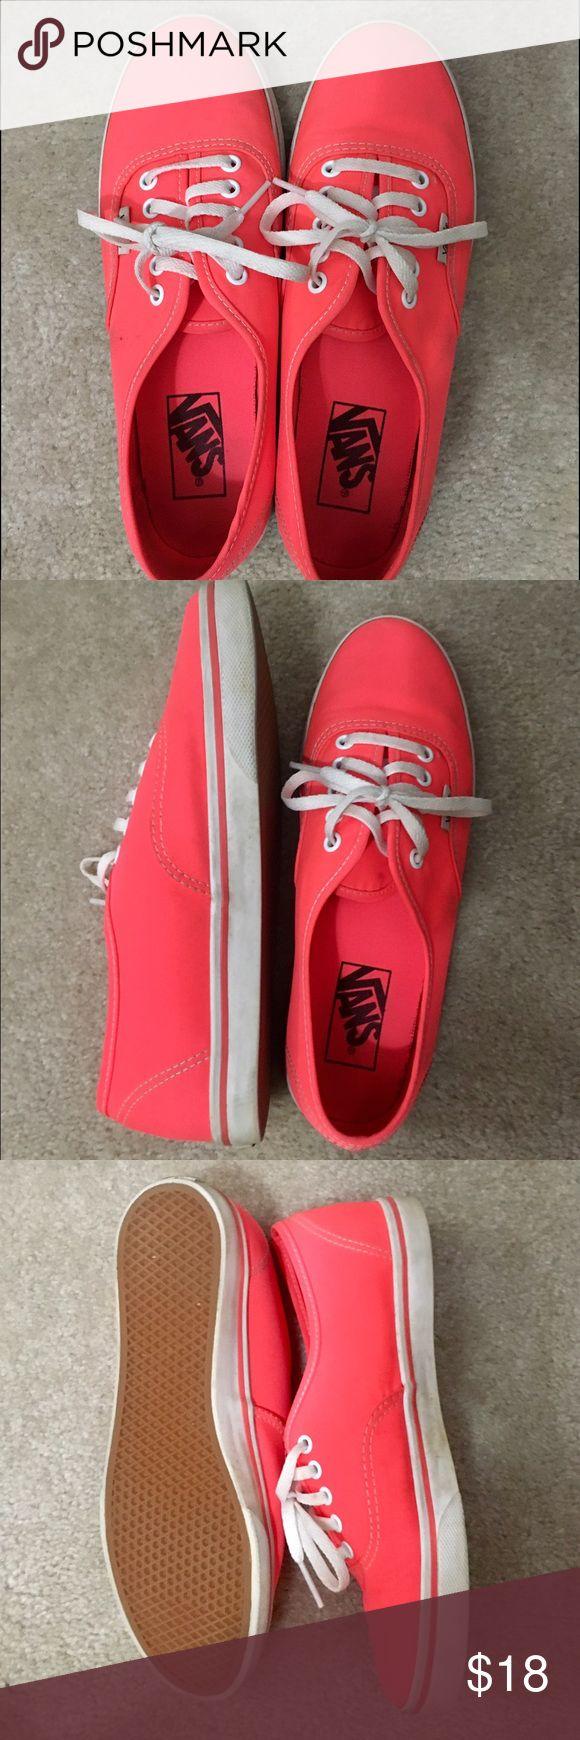 coral vans washable, worn once Vans Shoes Sneakers